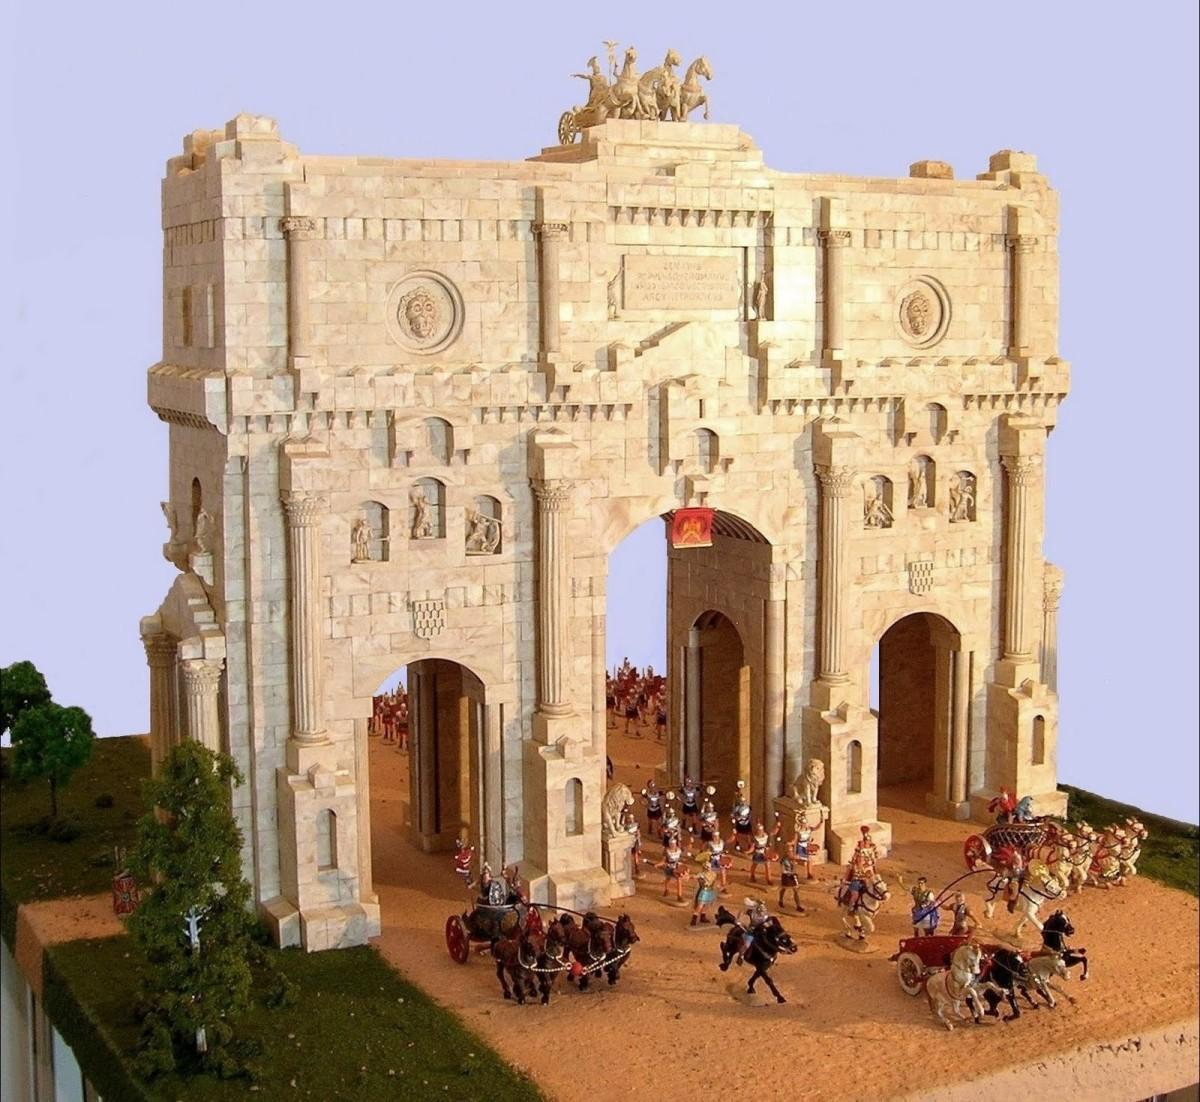 Exin Roman Triumphal Arch with Elastolin Roman figures, by Joaquín Morales.